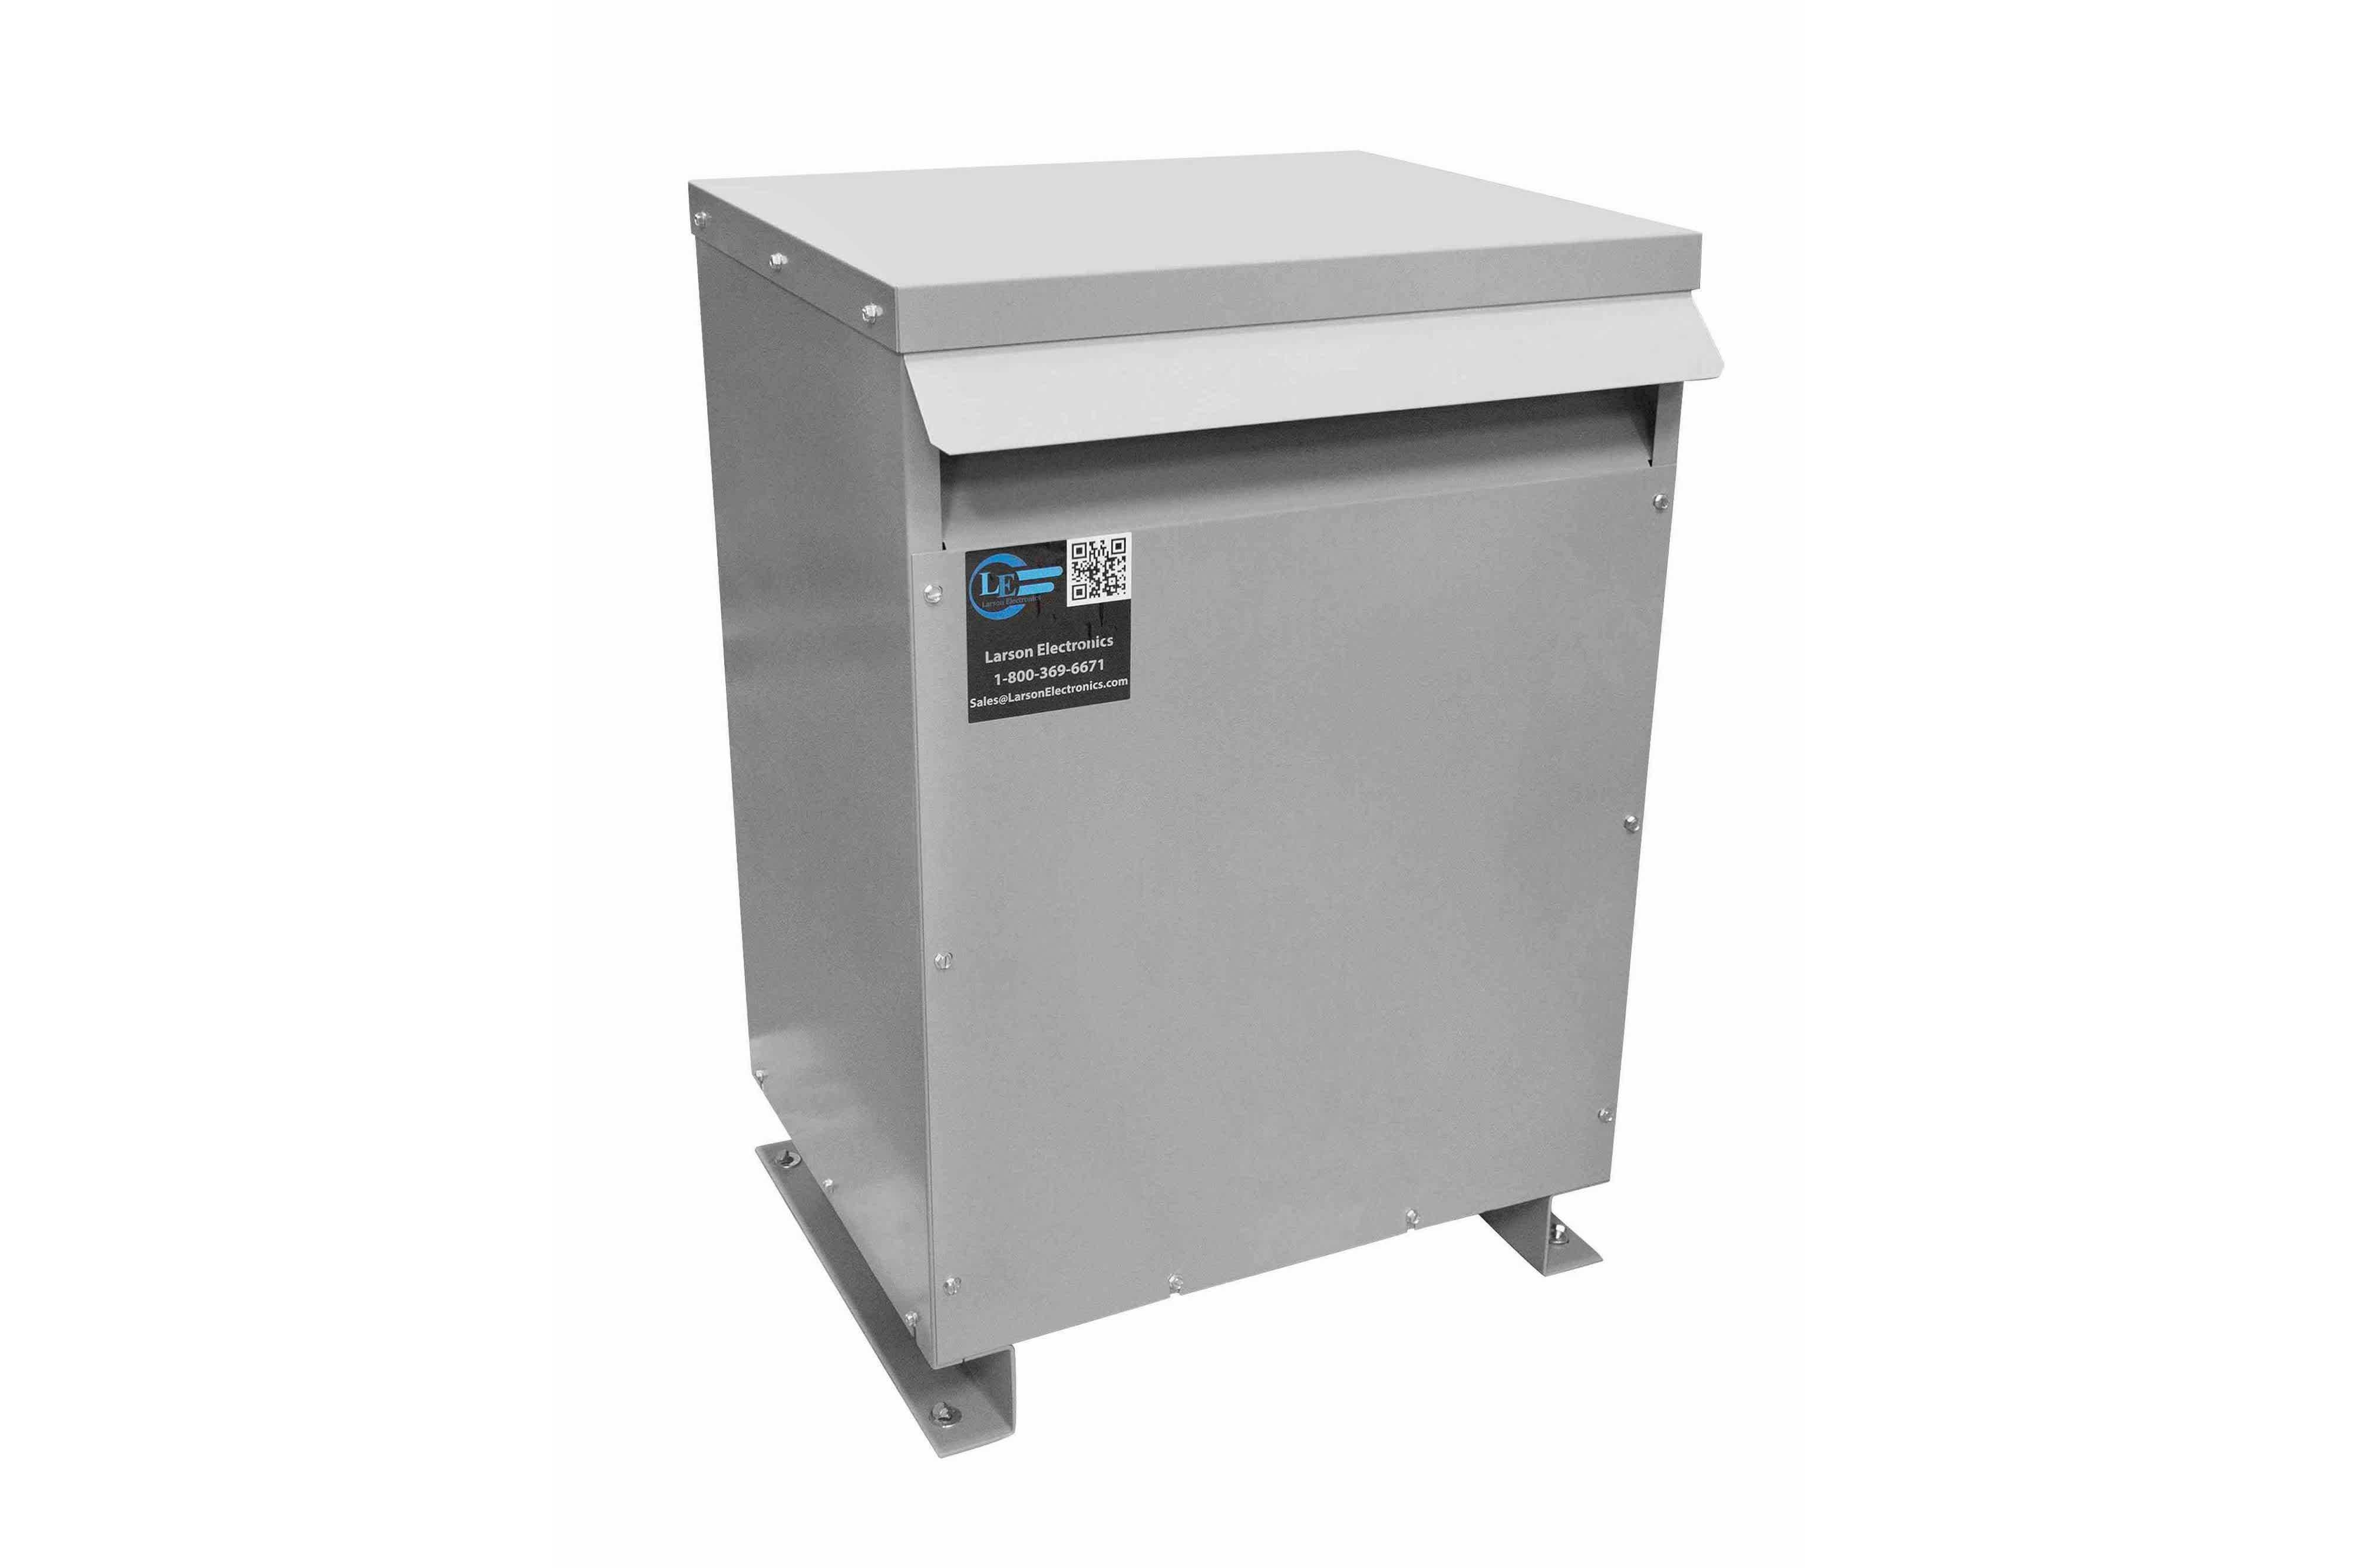 75 kVA 3PH Isolation Transformer, 460V Wye Primary, 415V Delta Secondary, N3R, Ventilated, 60 Hz